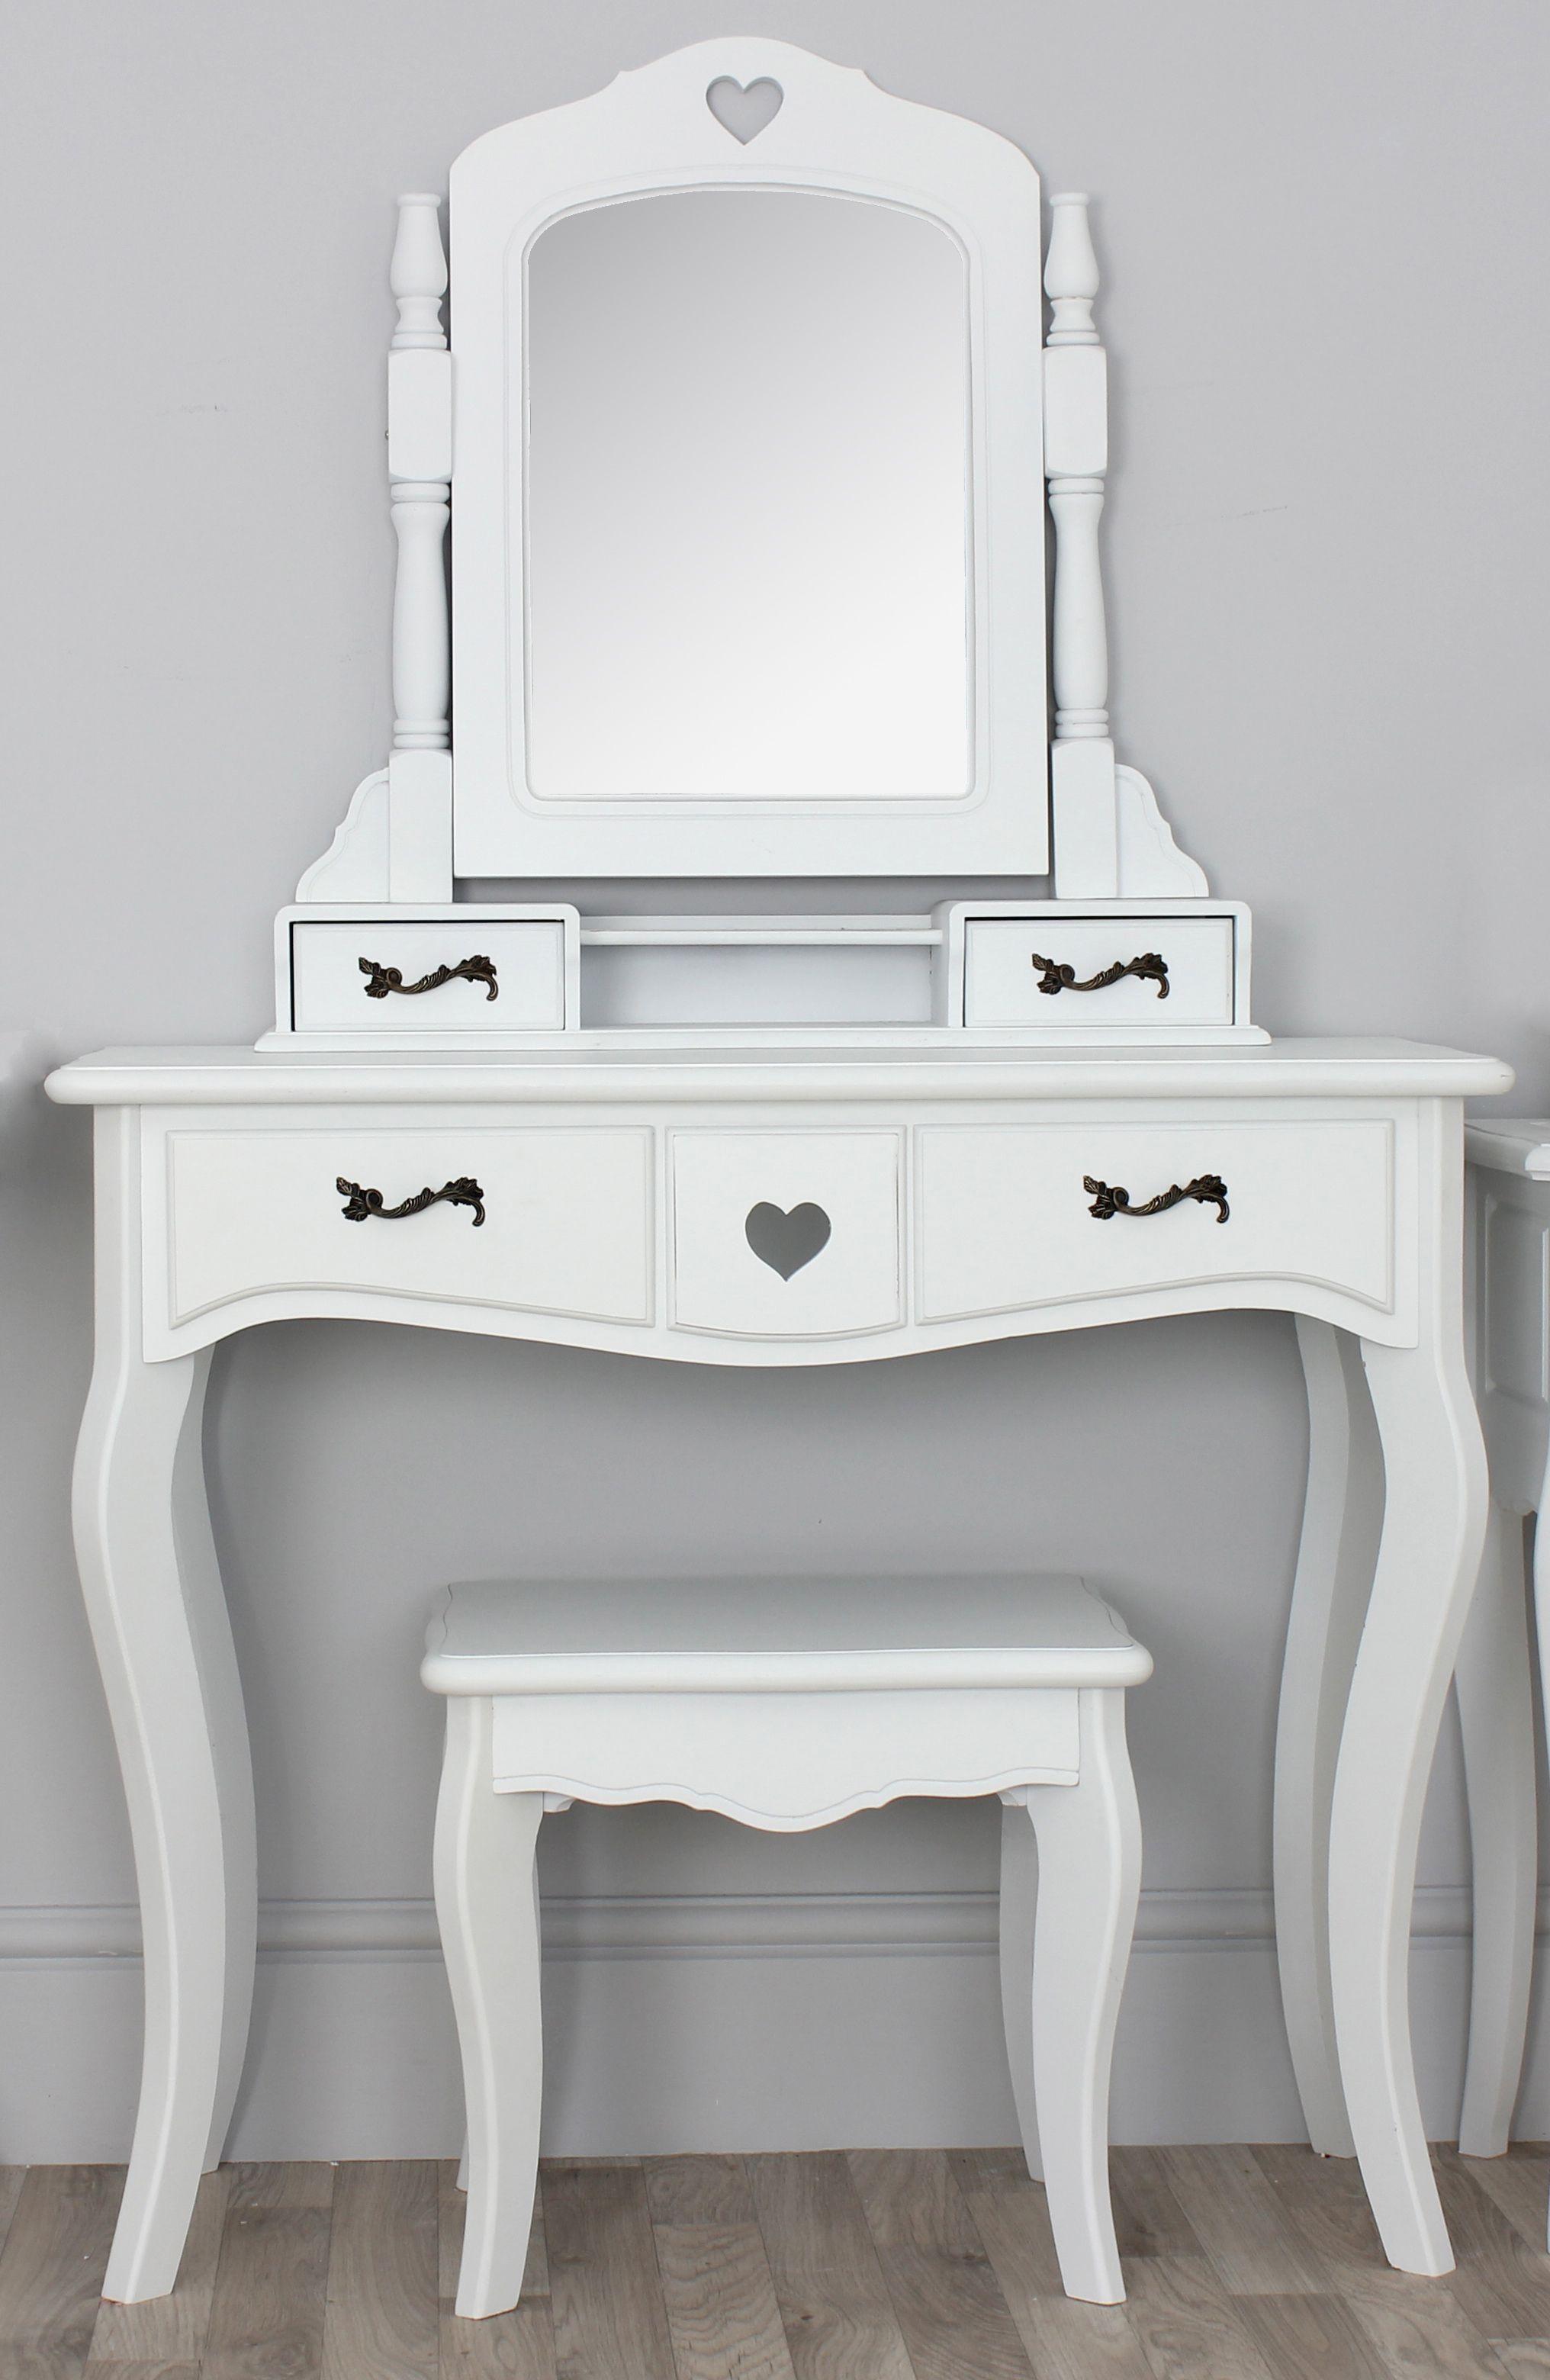 White dressing table vanity mirror bedroom design pinterest white dressing table vanity mirror geotapseo Choice Image